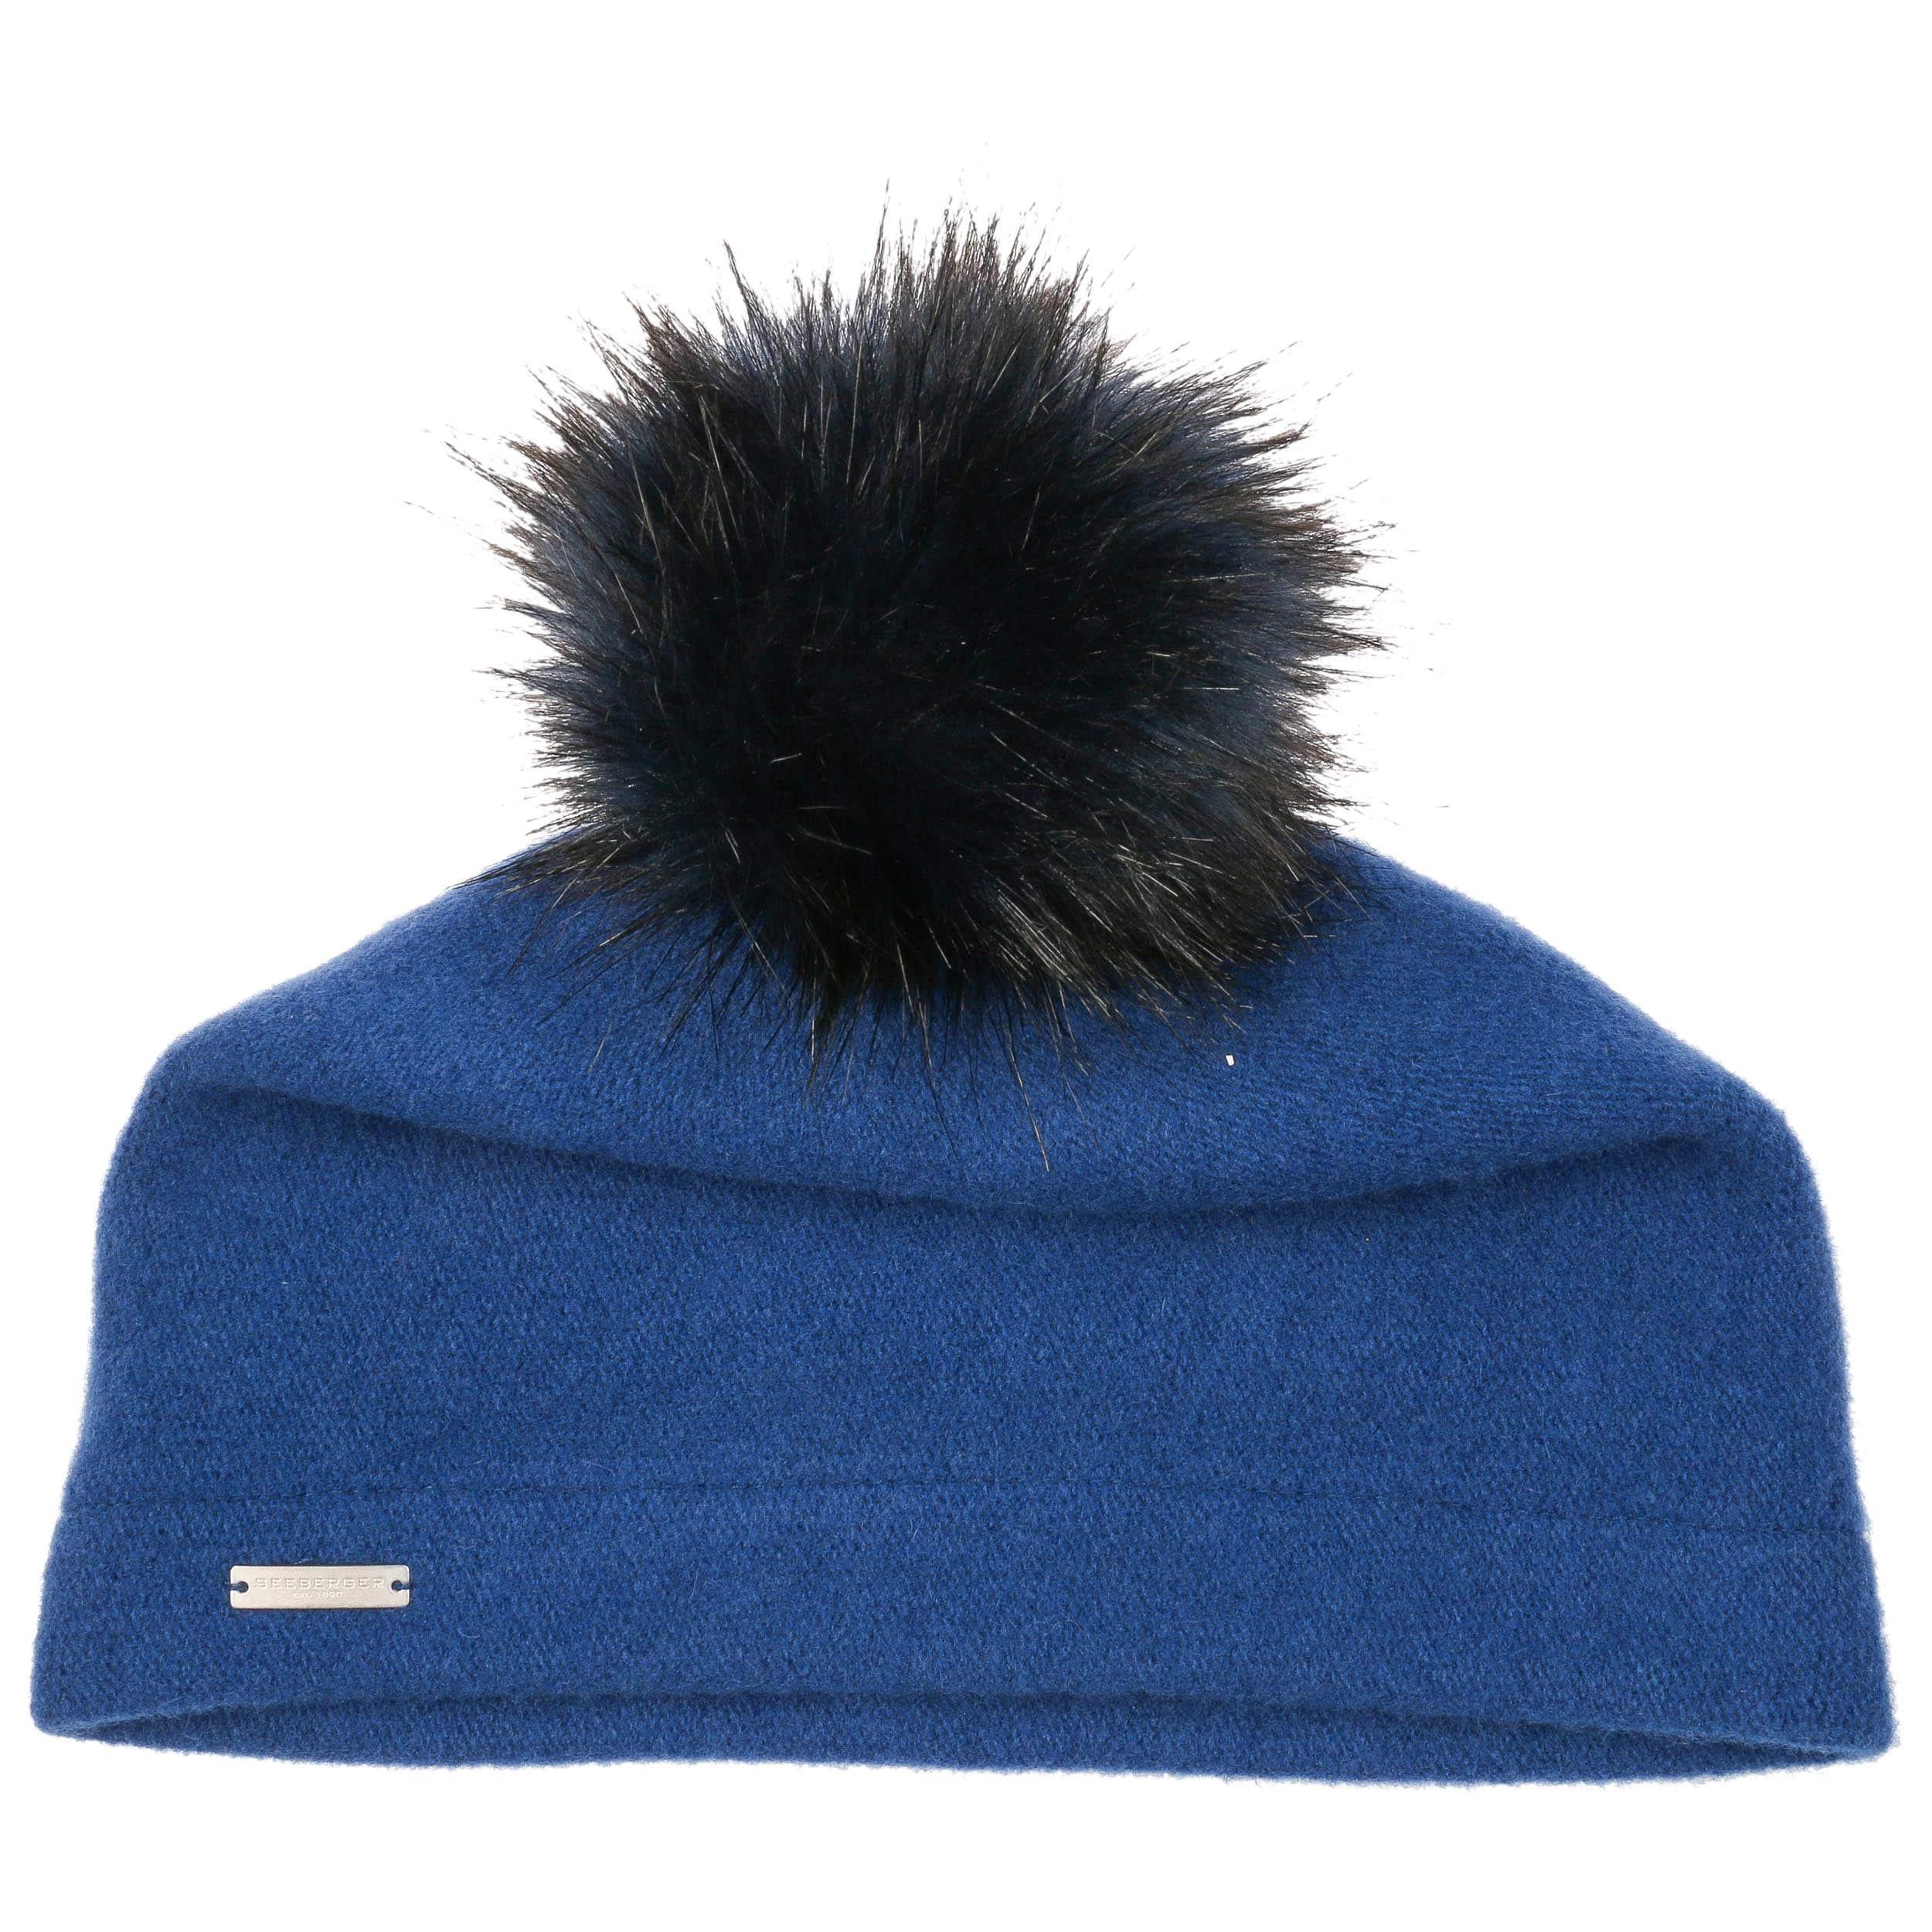 03b16de2d77 ... Tamisa Milled Wool Hat by Seeberger - blue 1 ...